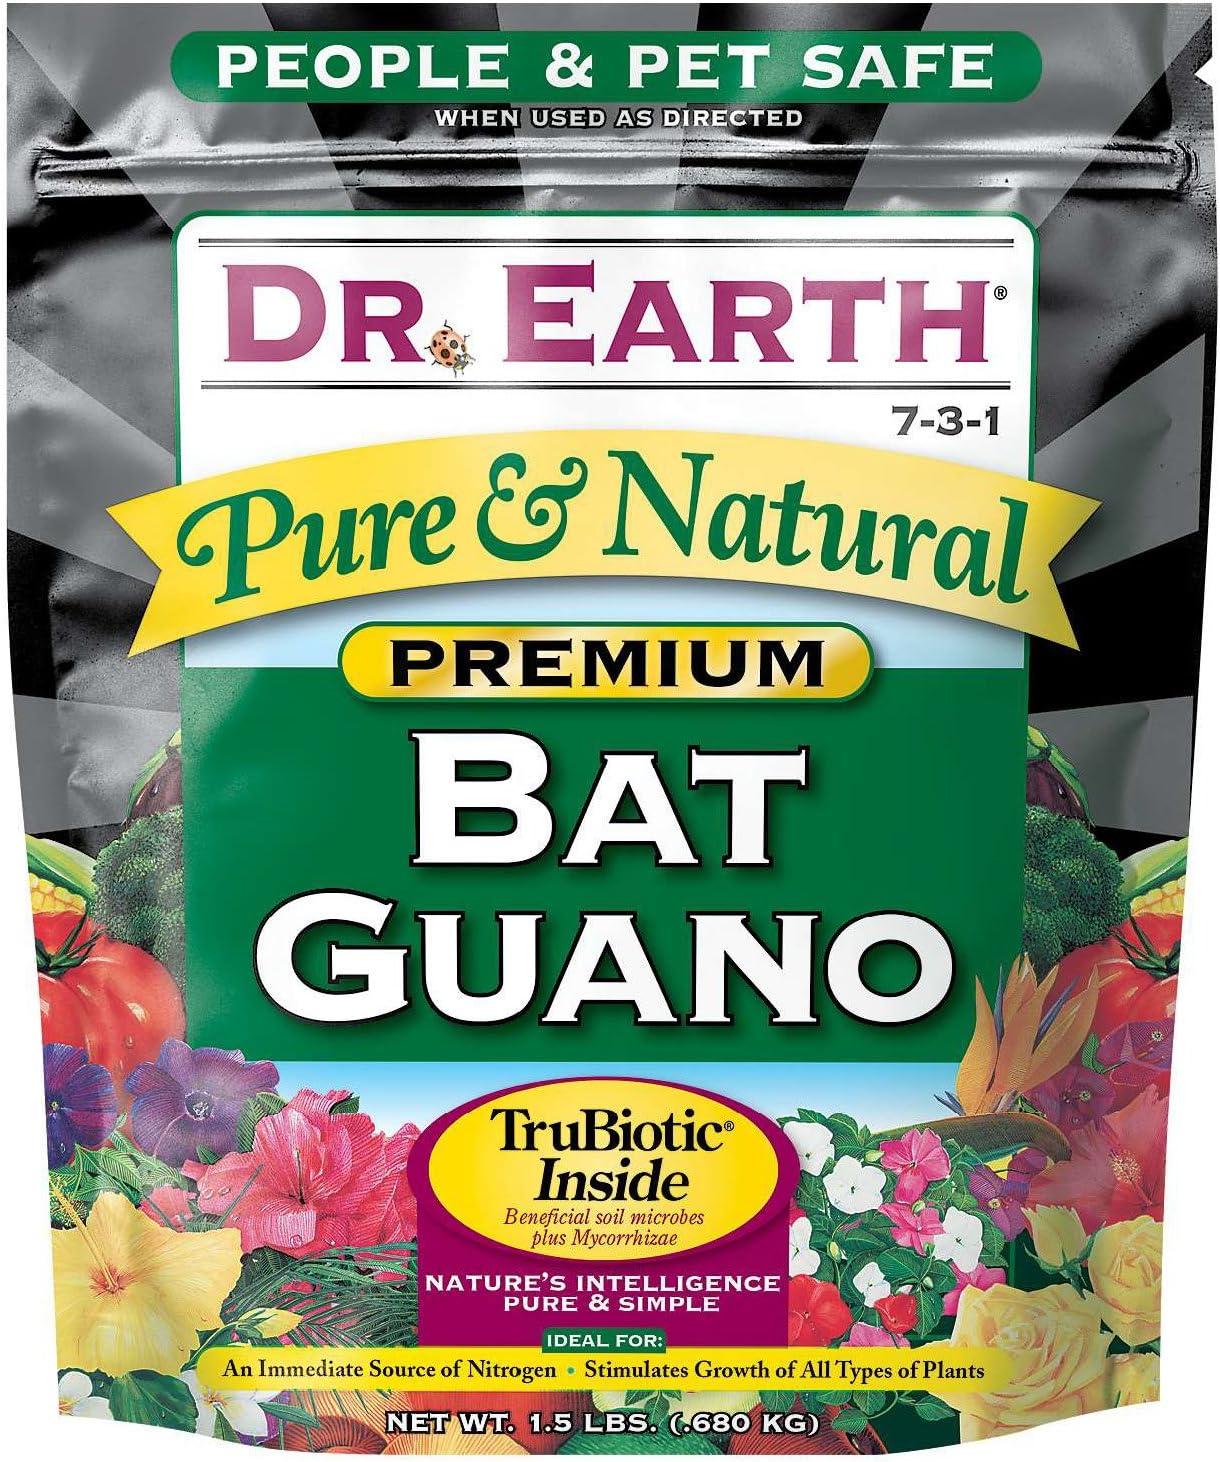 1 LB Bat Guano SOIL AMENDMENT ORGANIC FERTILIZER GARDEN NO ODOR Vegetarian GROW